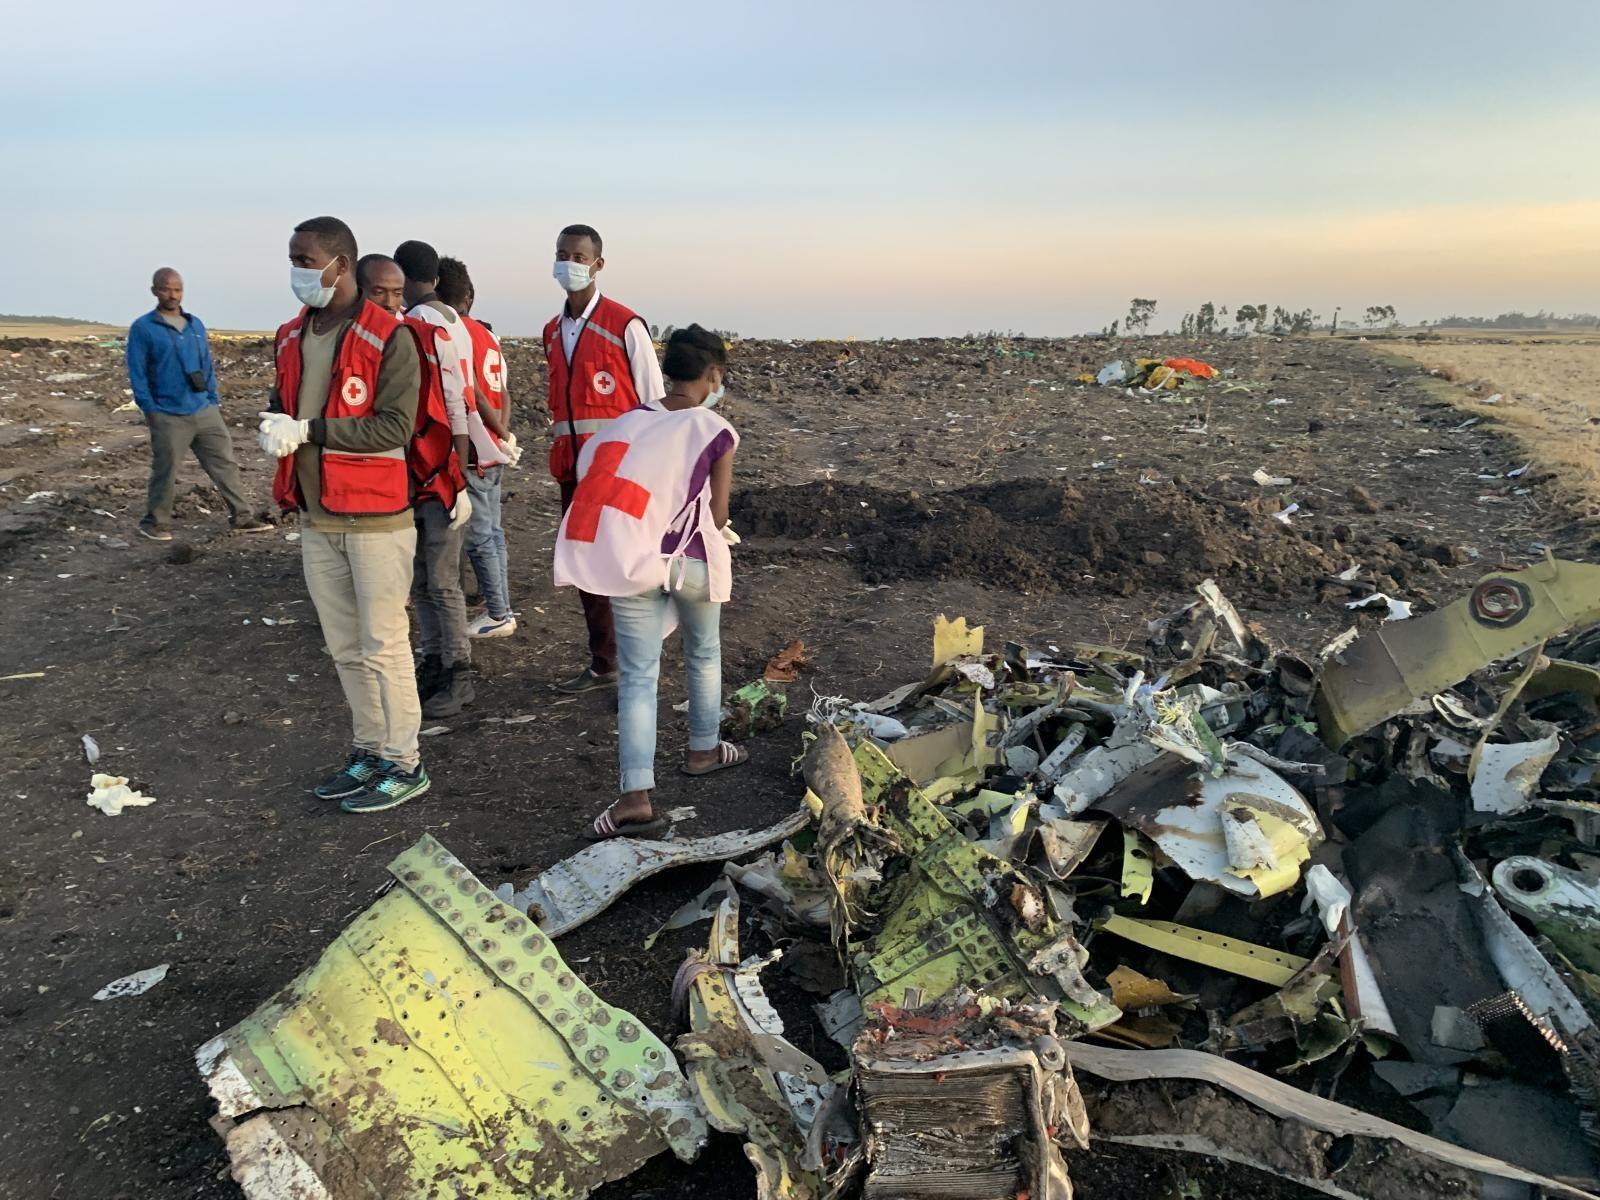 Mesto nesreče etiopskega boeinga 737 MAX 8 Vir:Pixsell